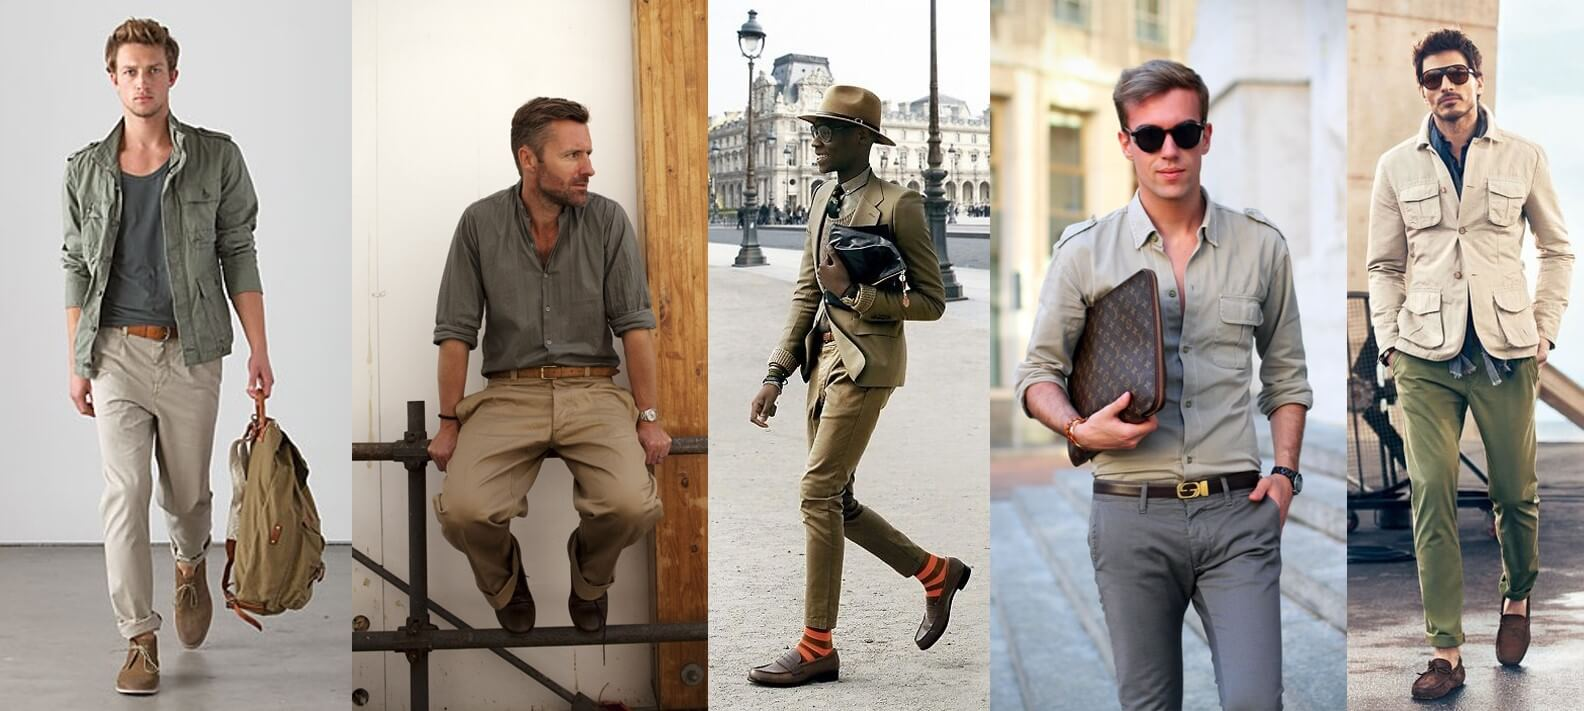 Colonial fashion for men